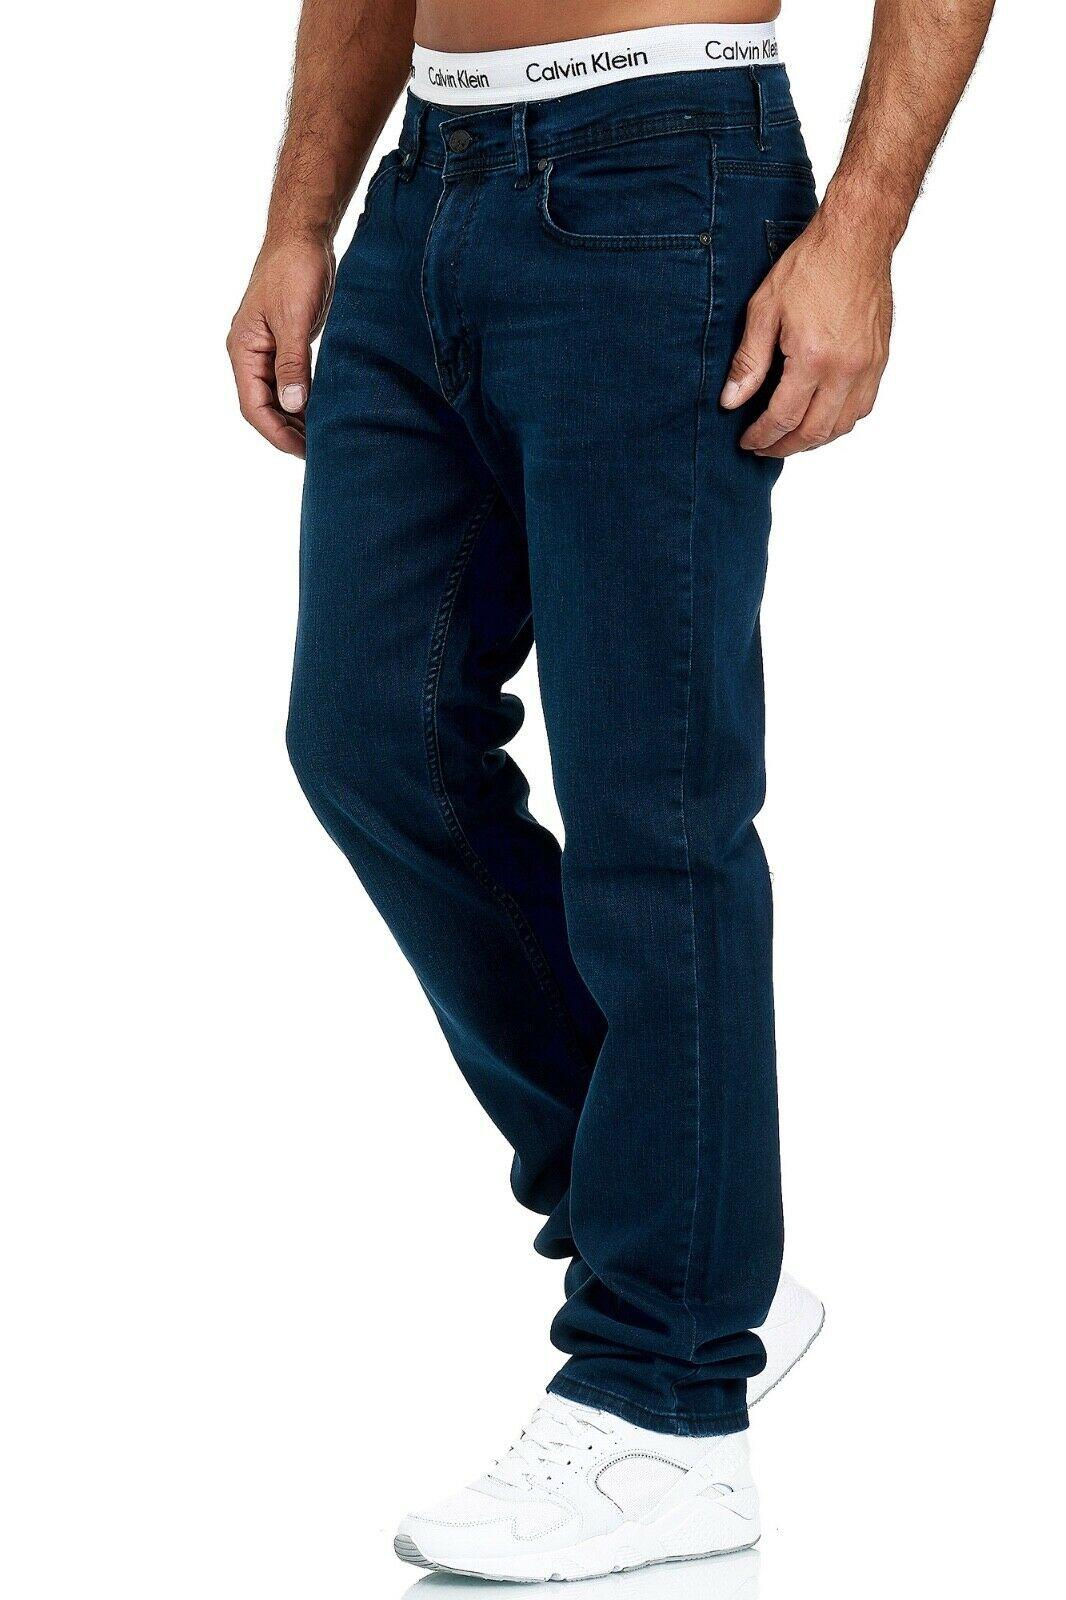 Herren-Jeans-Hose-Denim-KC-Black-Washed-Straight-Cut-Regular-Dicke-Naht-naehte Indexbild 42